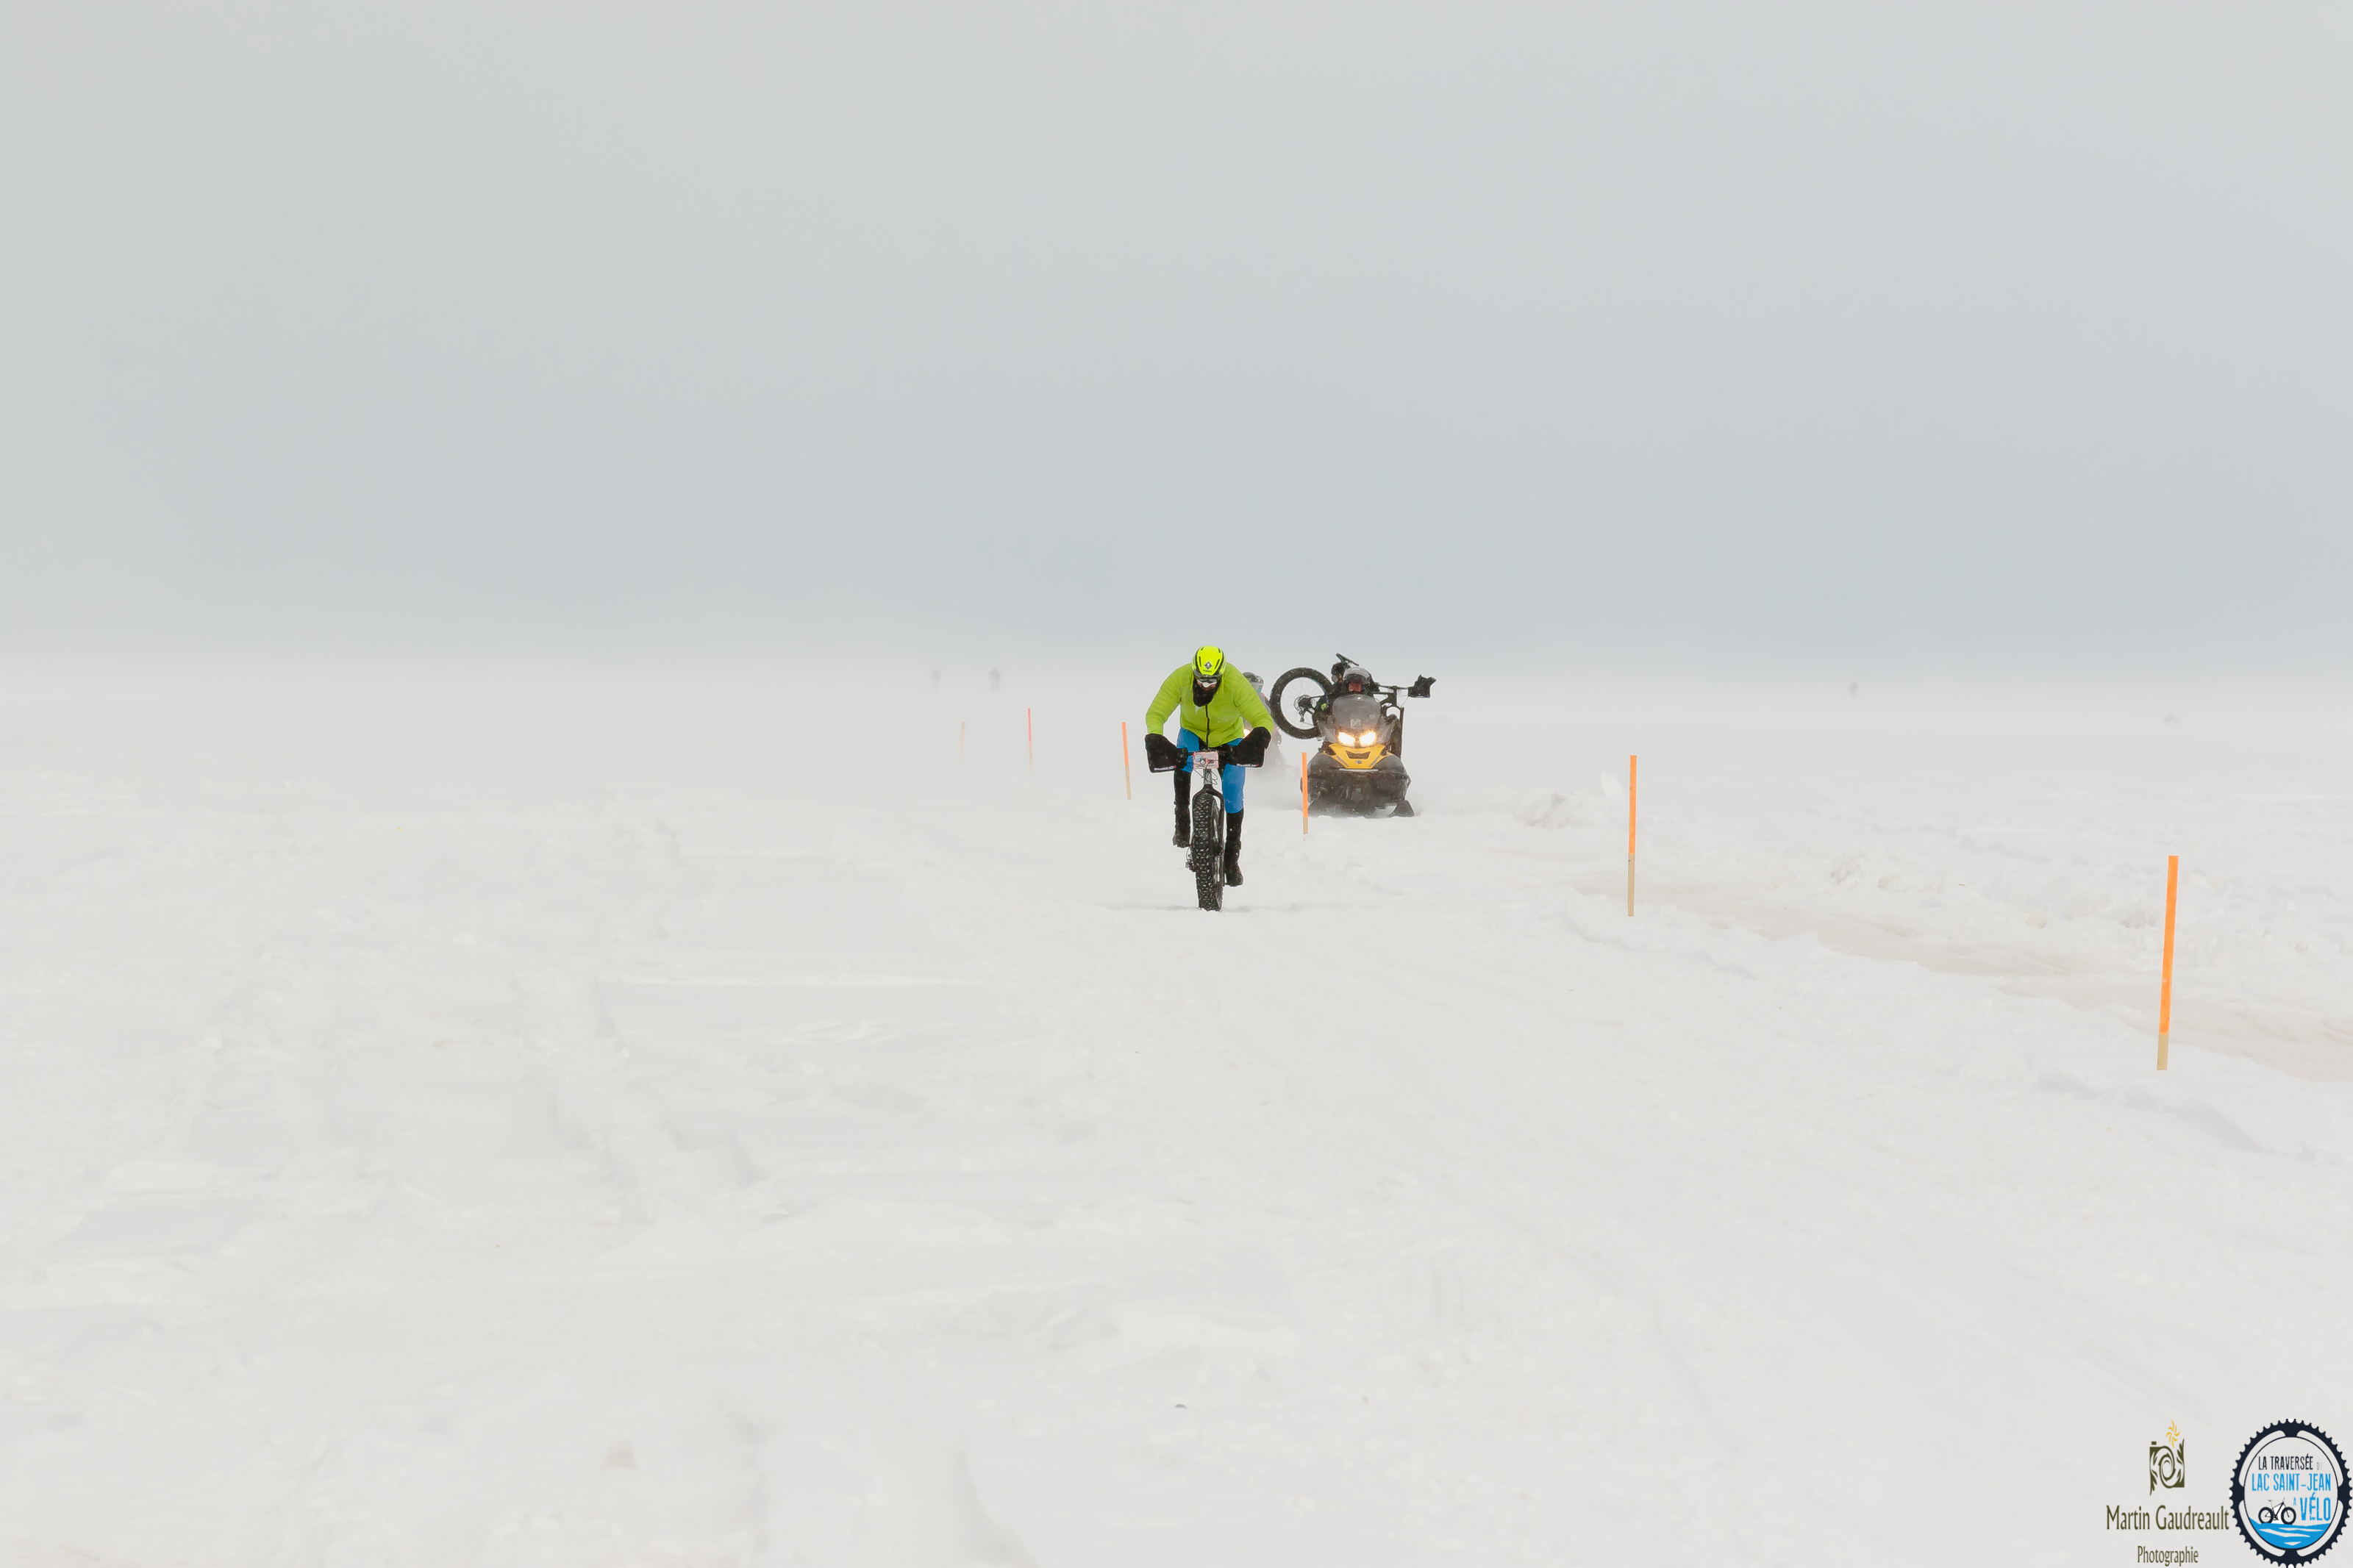 infovelo-com-traversee-lac-saint-jean-velo-fatbike3